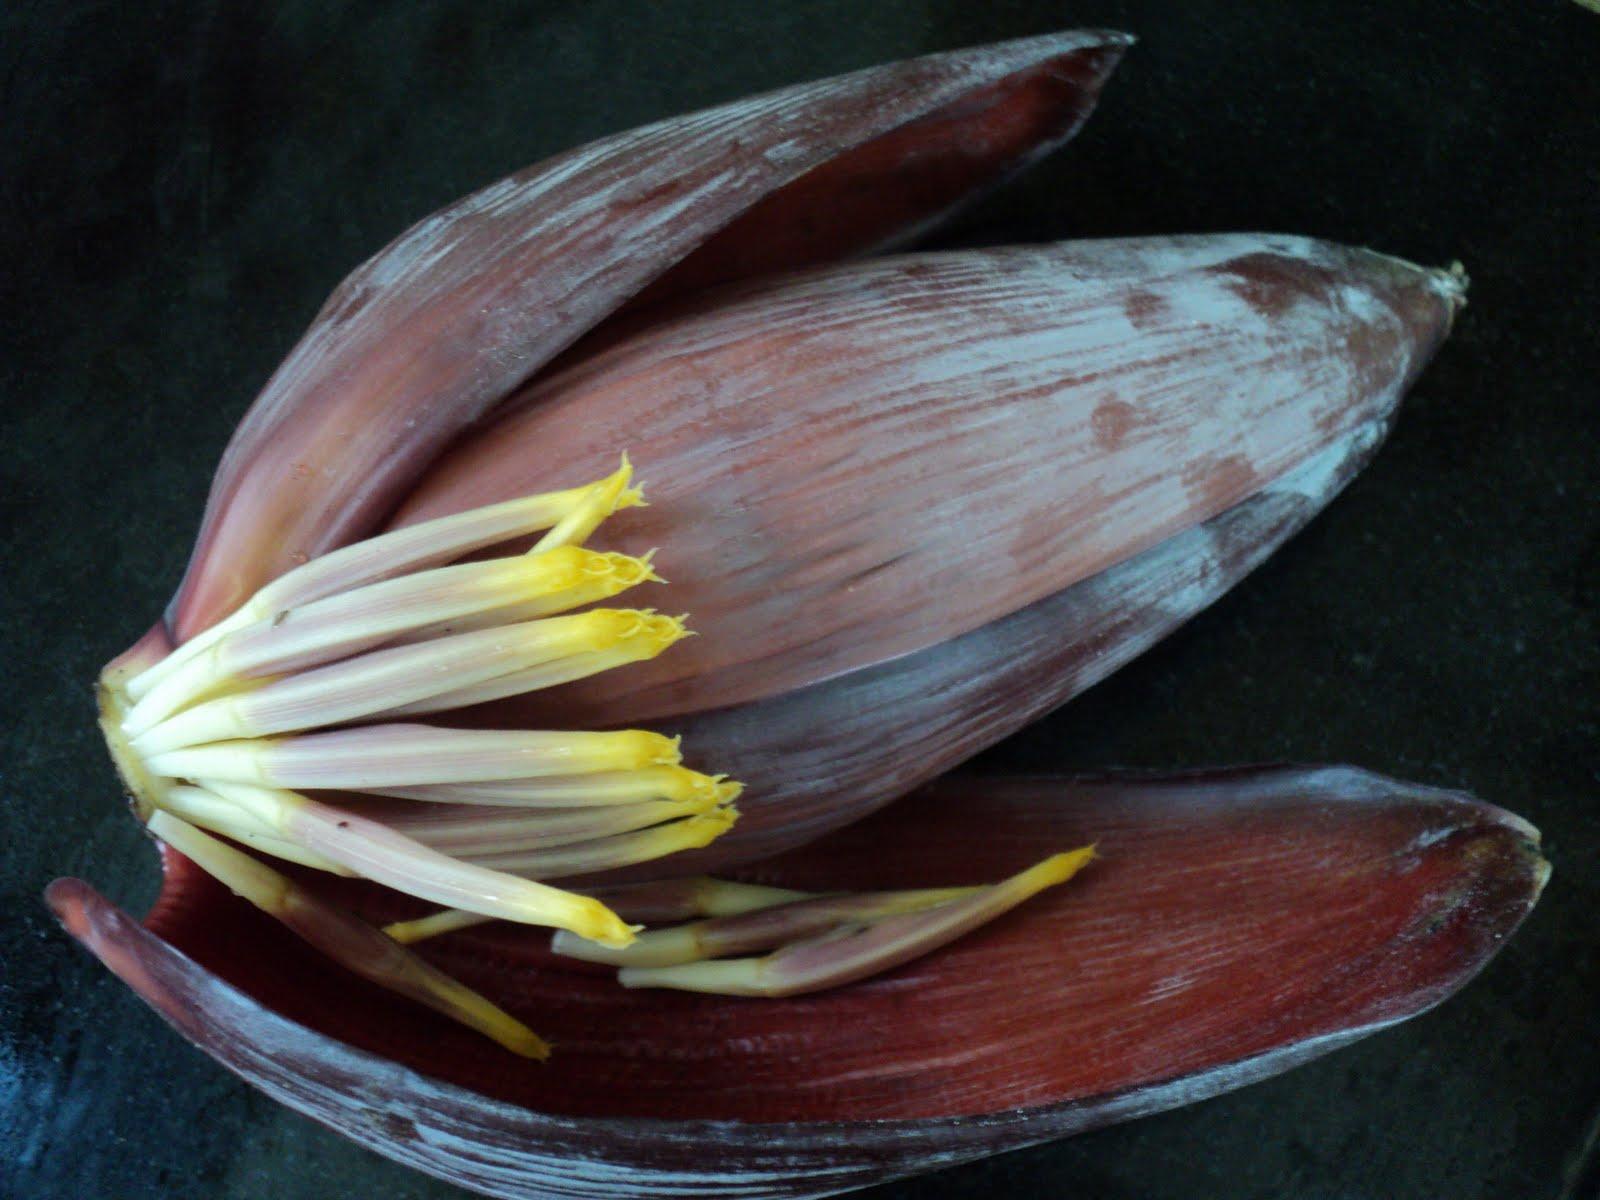 Kadali Bhanda Raee Banana Flower Curry Oriya Odia Recipe Curry Tarakari